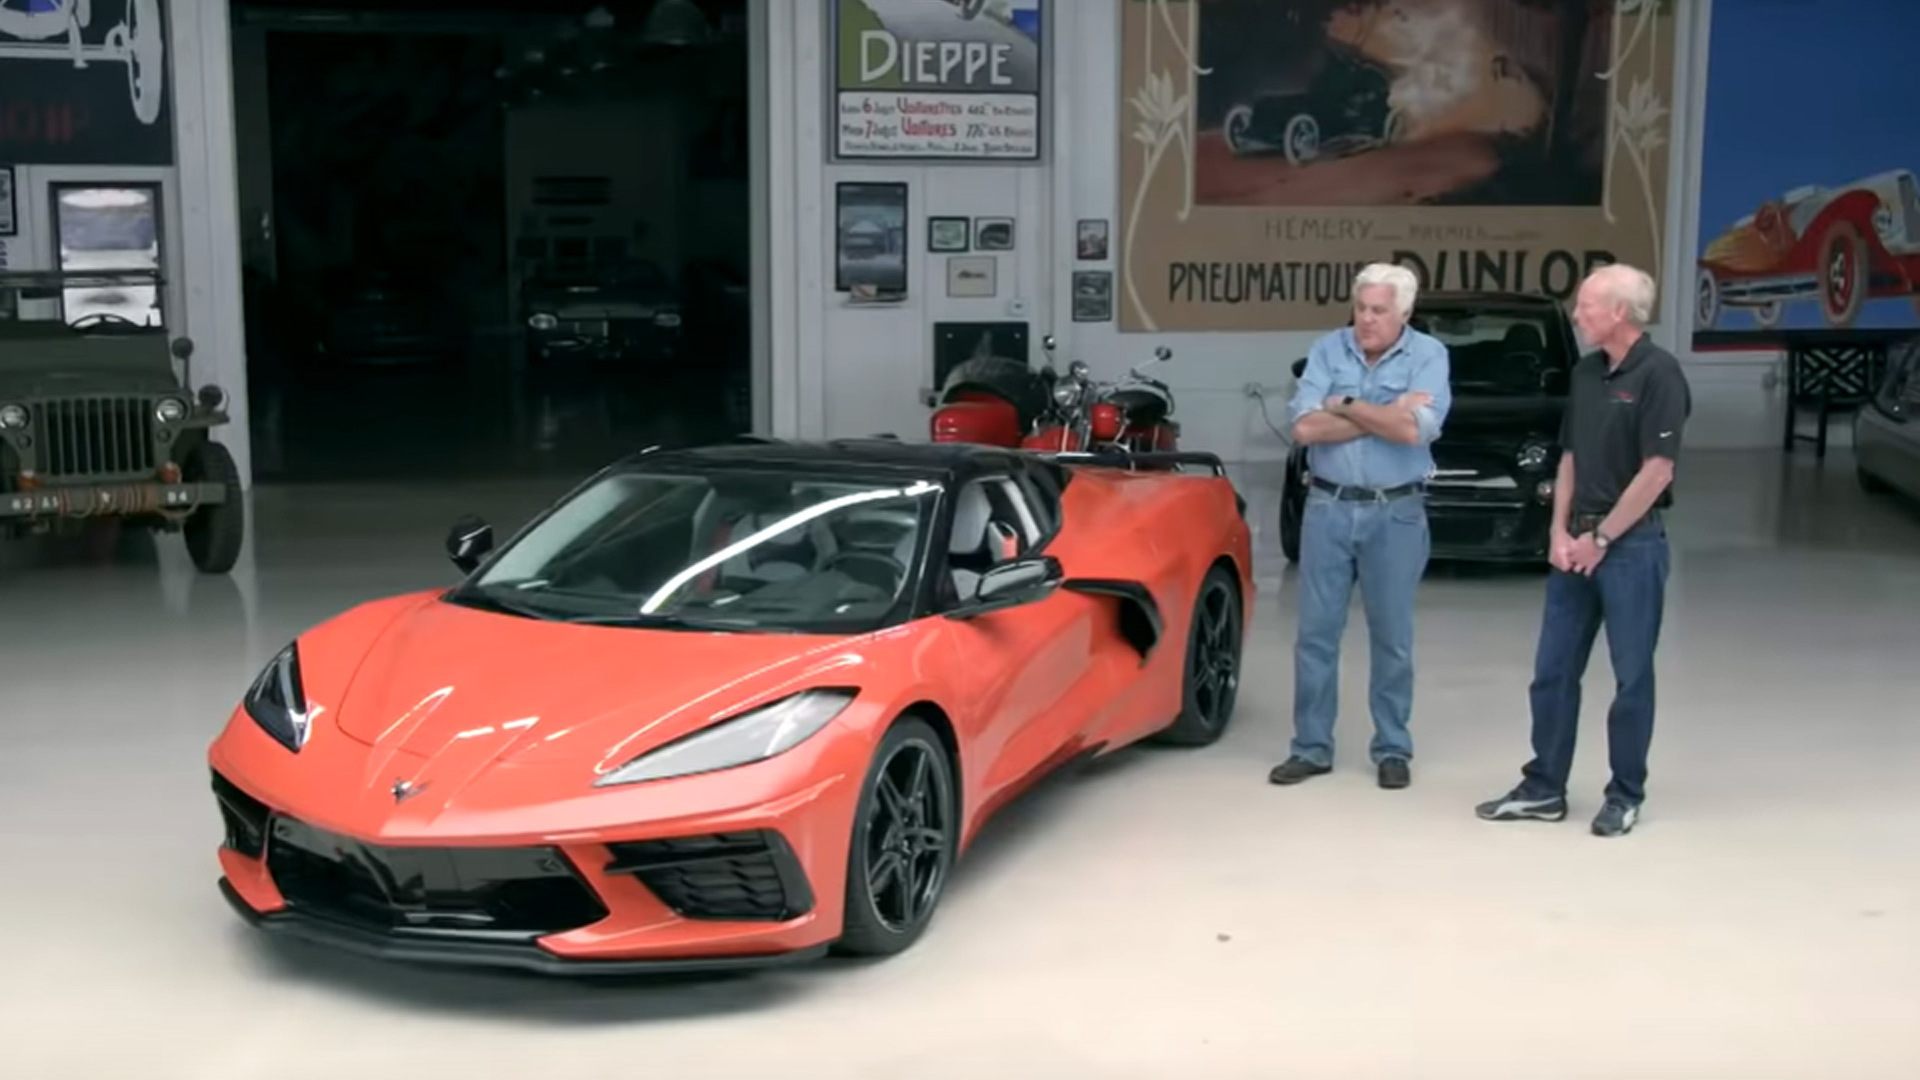 2020 Chevrolet Corvette Stingray Convertible at Jay Leno's Garage